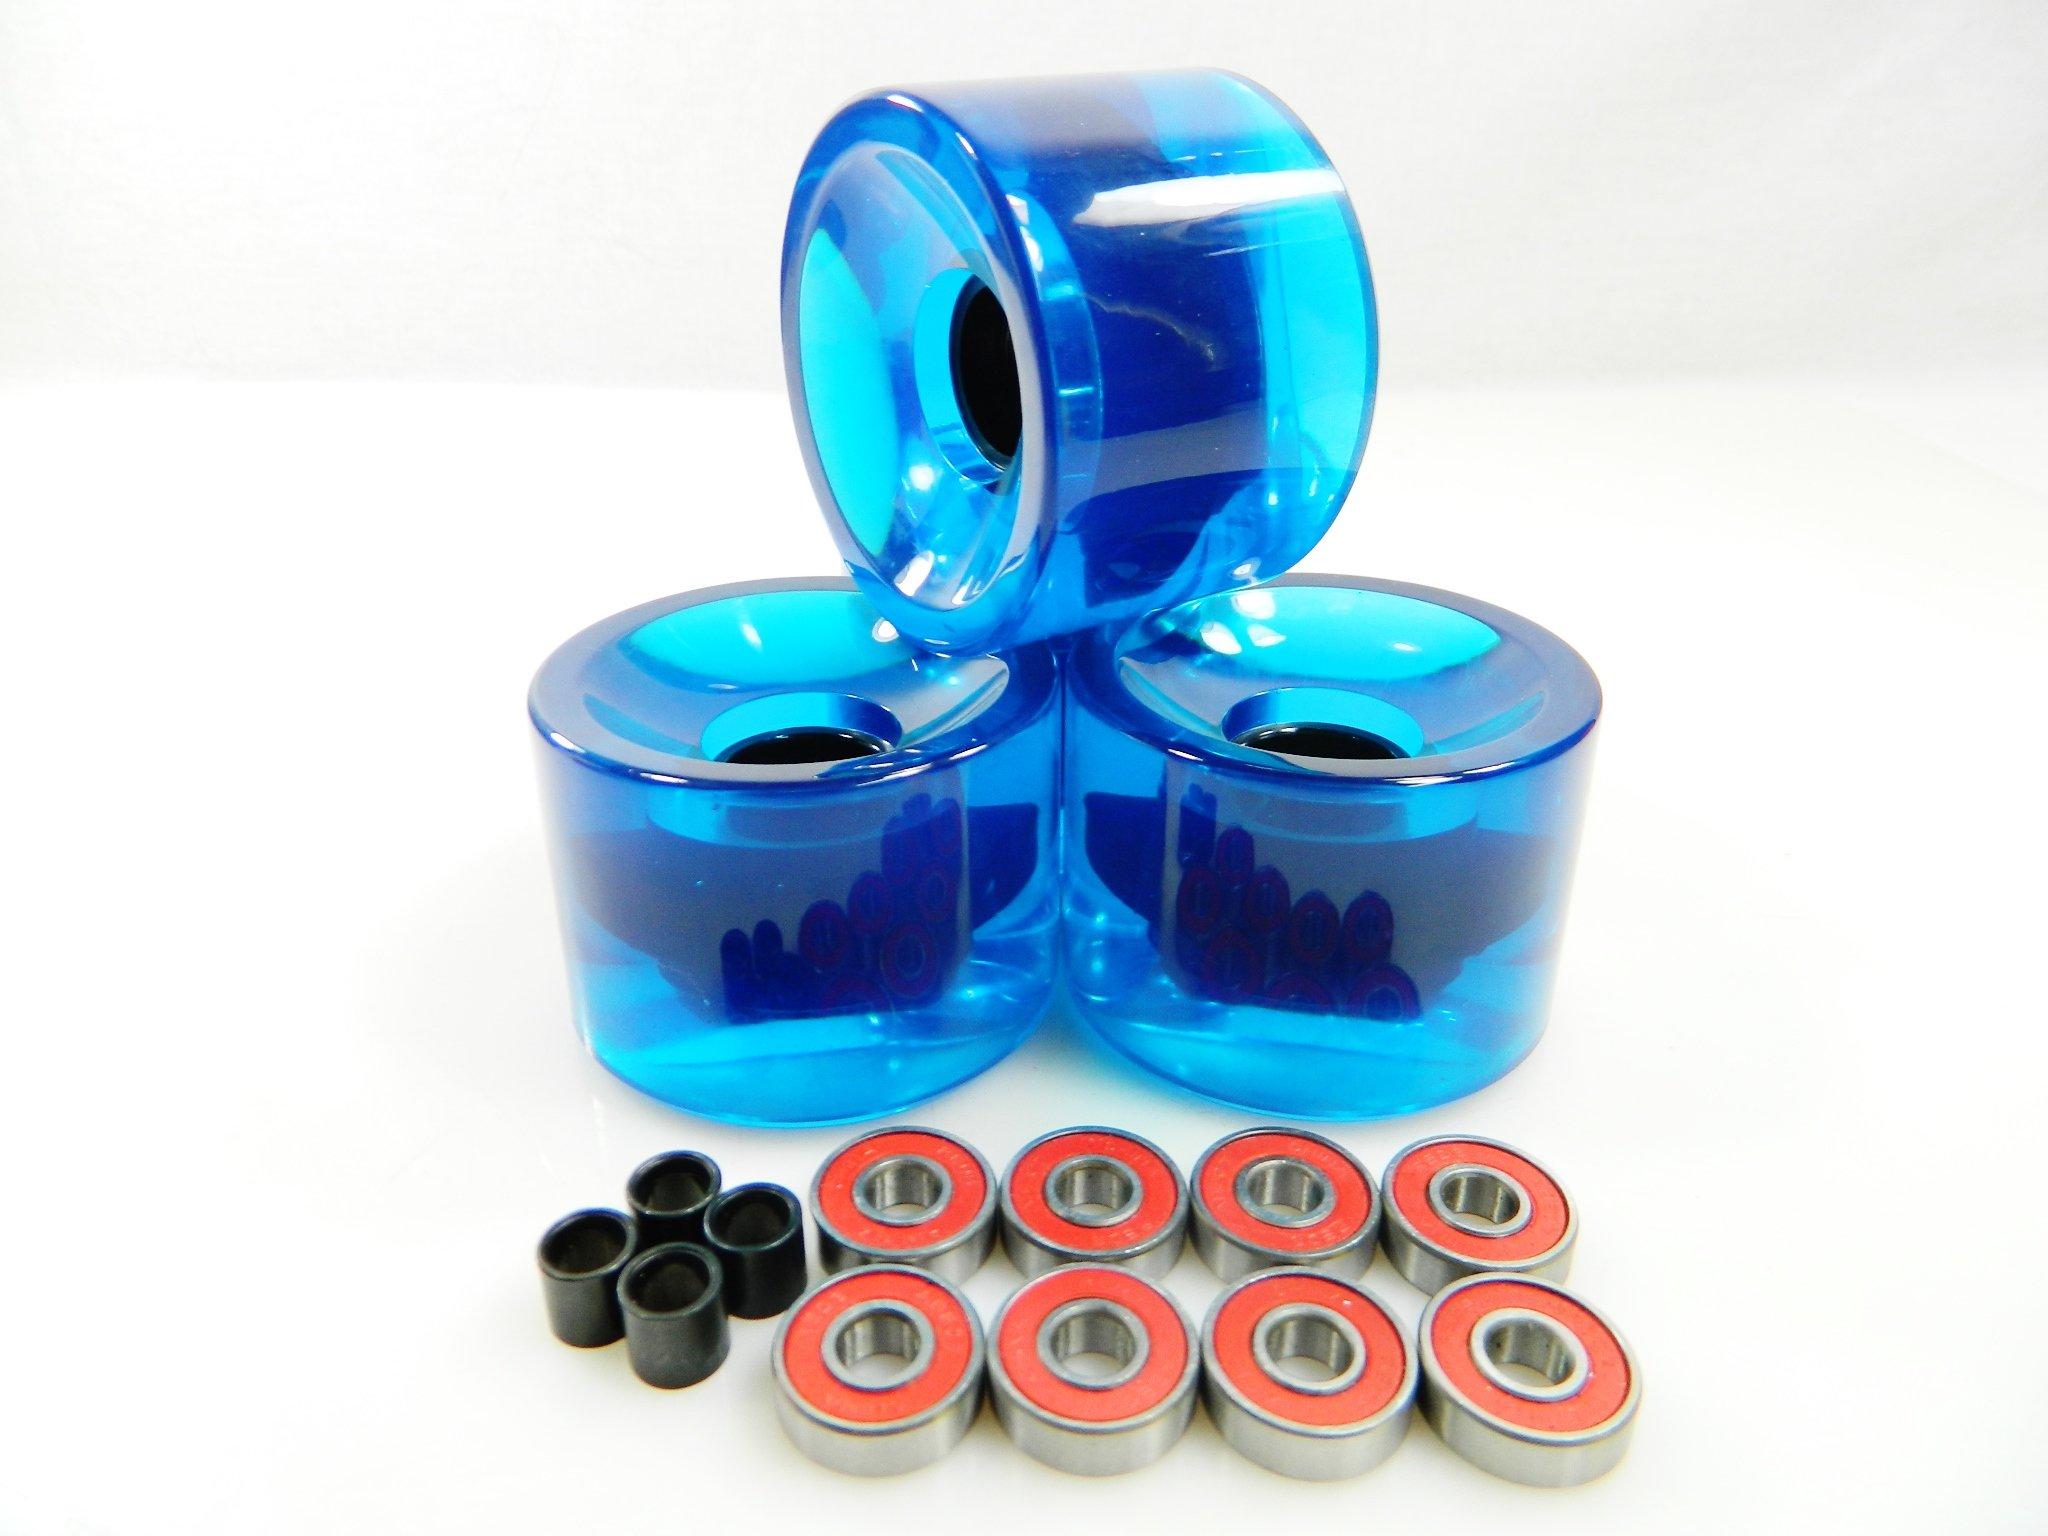 70mm Longboard Skateboard Wheels + ABEC 7 Bearings Spacers